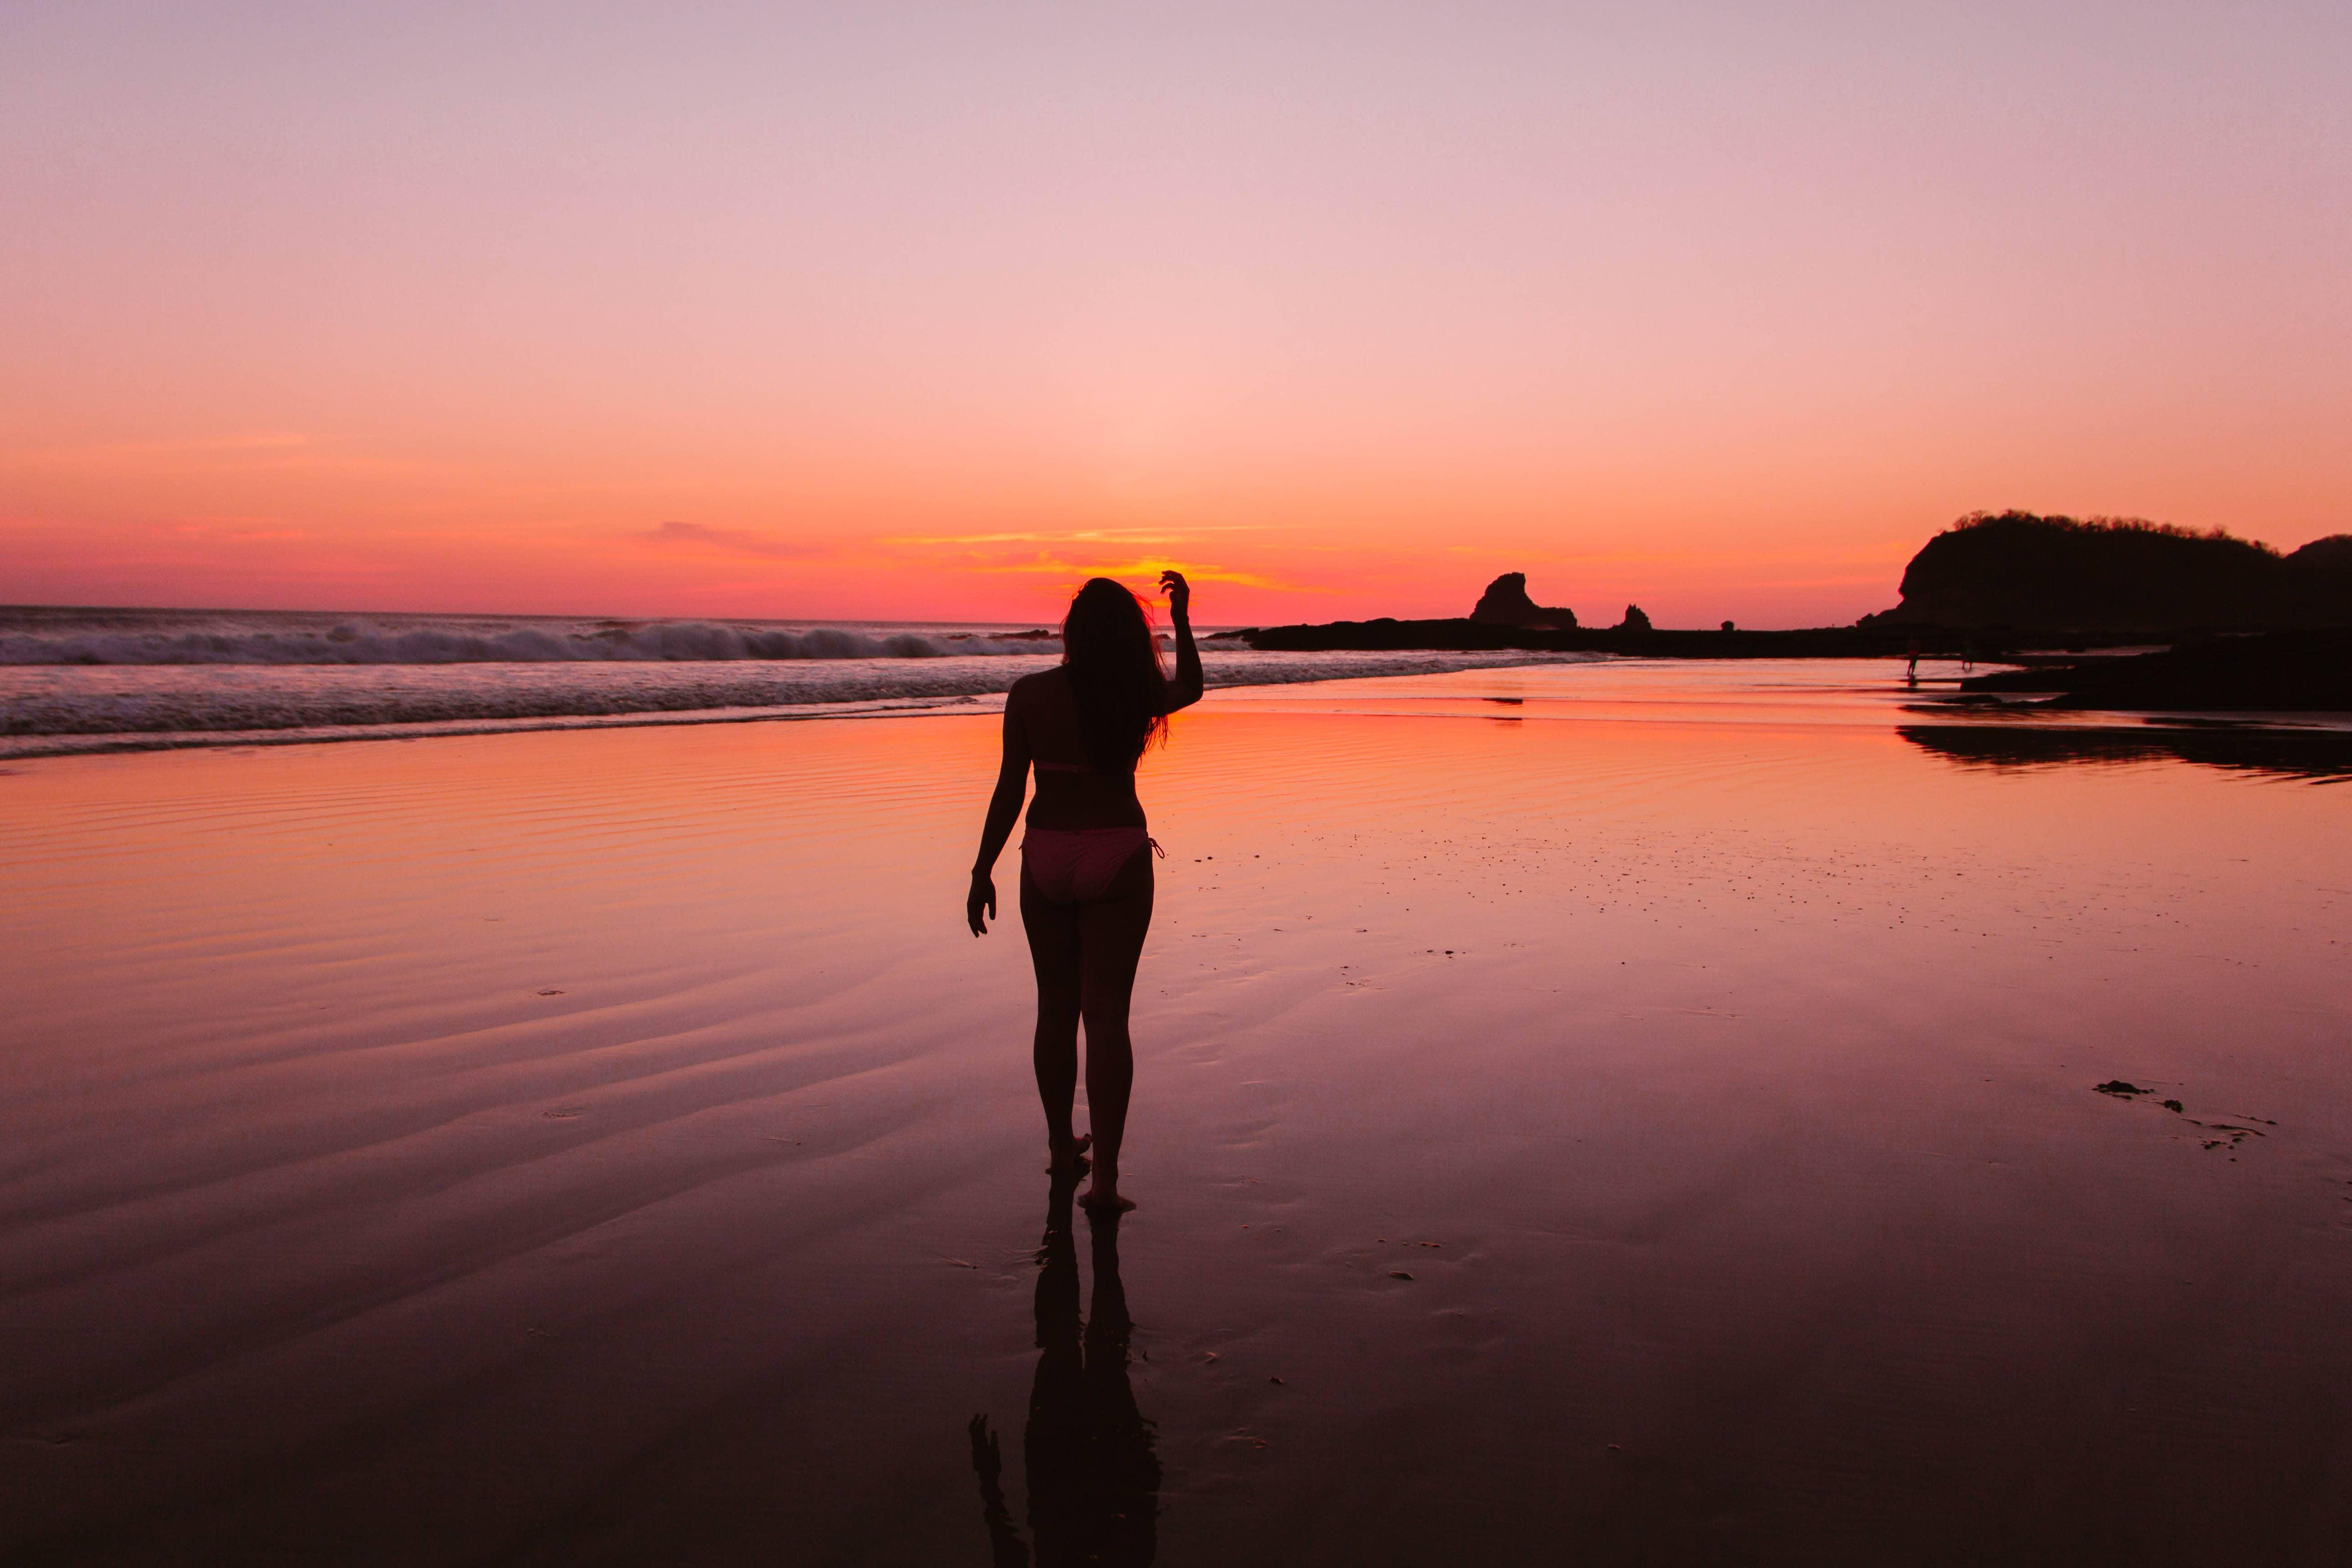 Erica Latack at Playa Maderas, Nicaragua